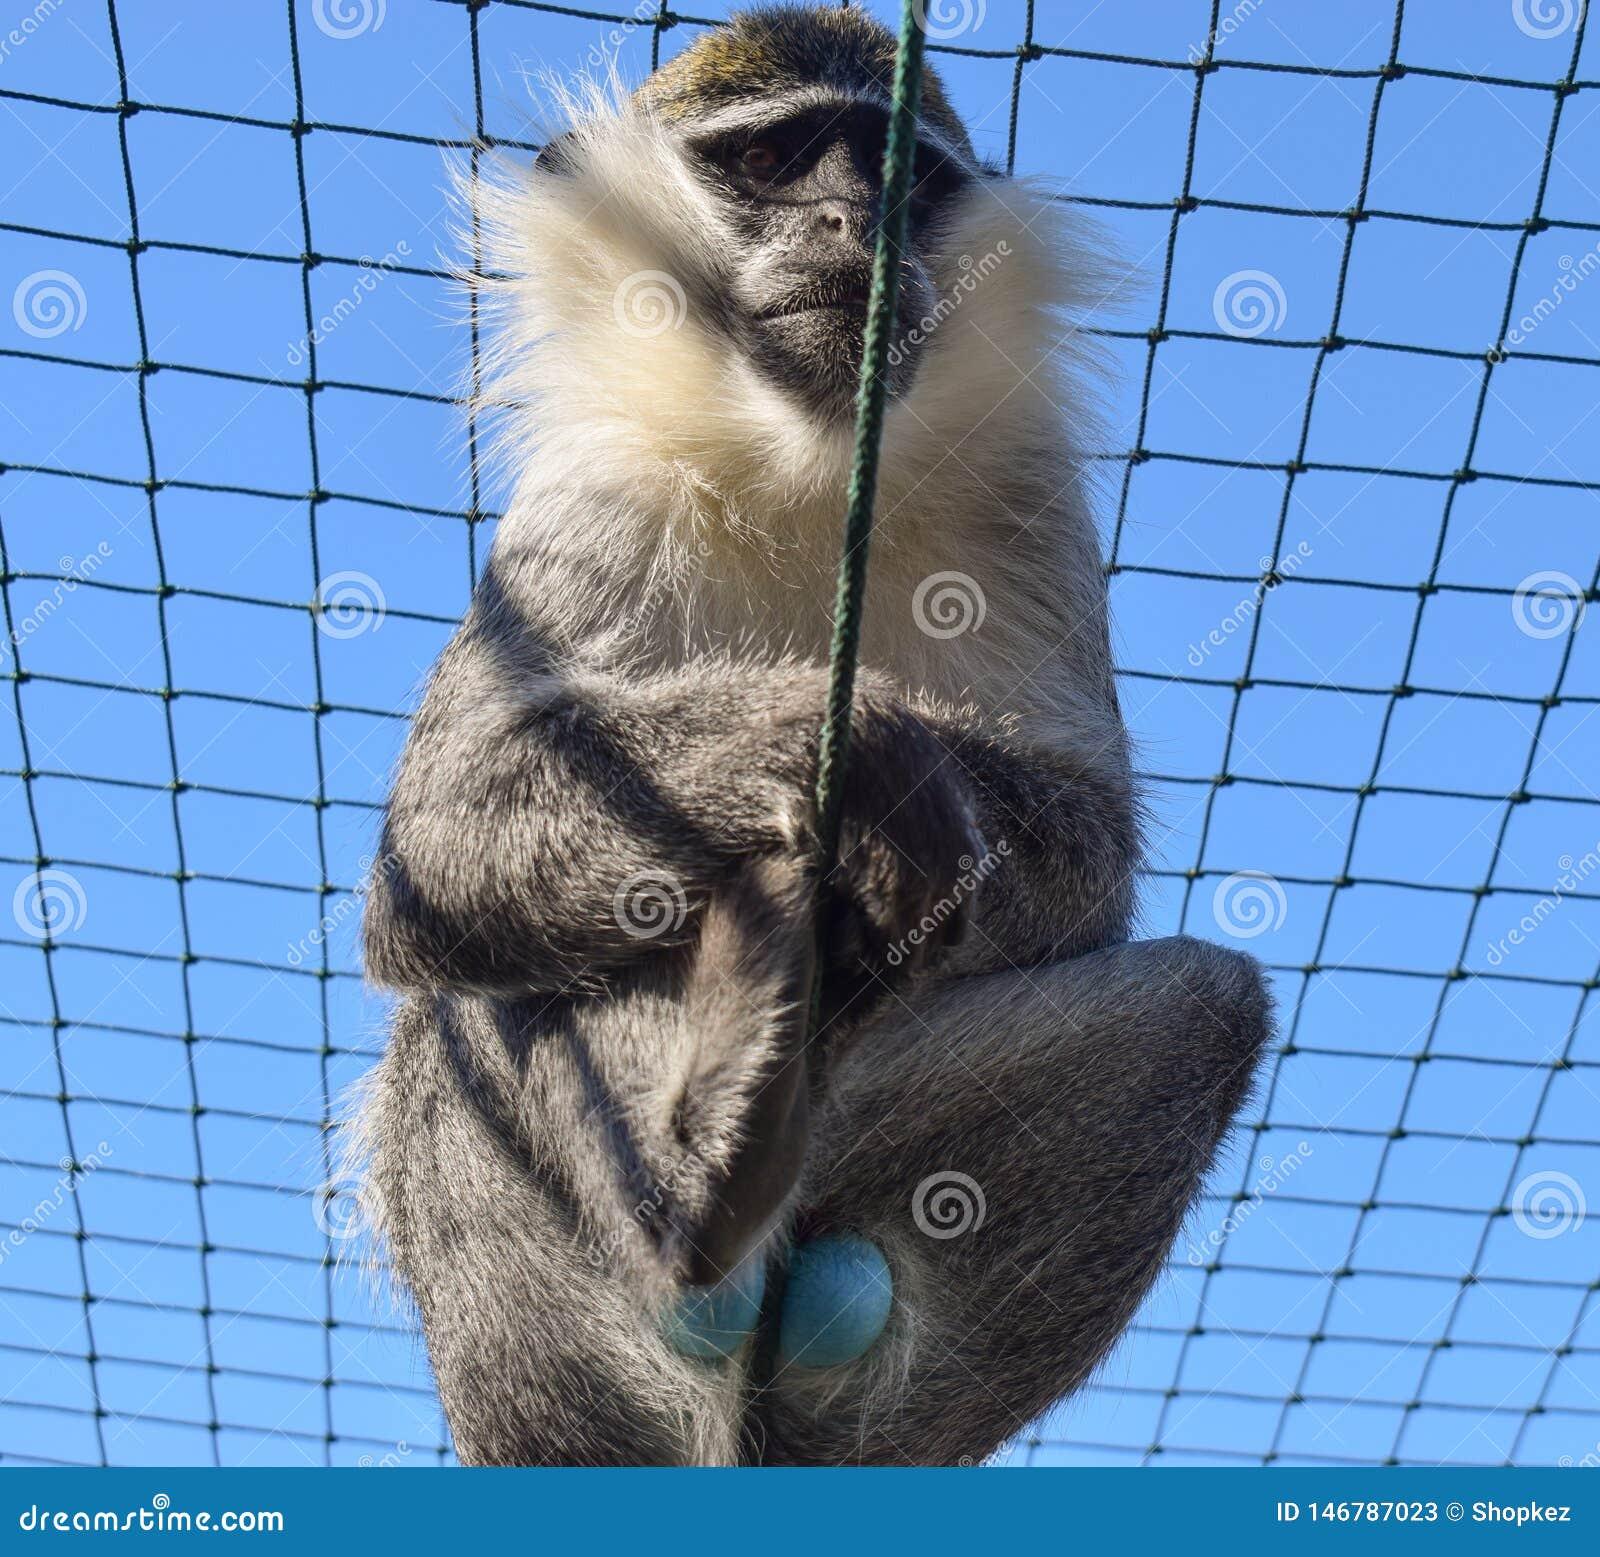 Blue Balled Vervet Monkey. Monkey with blue testicles in captivity